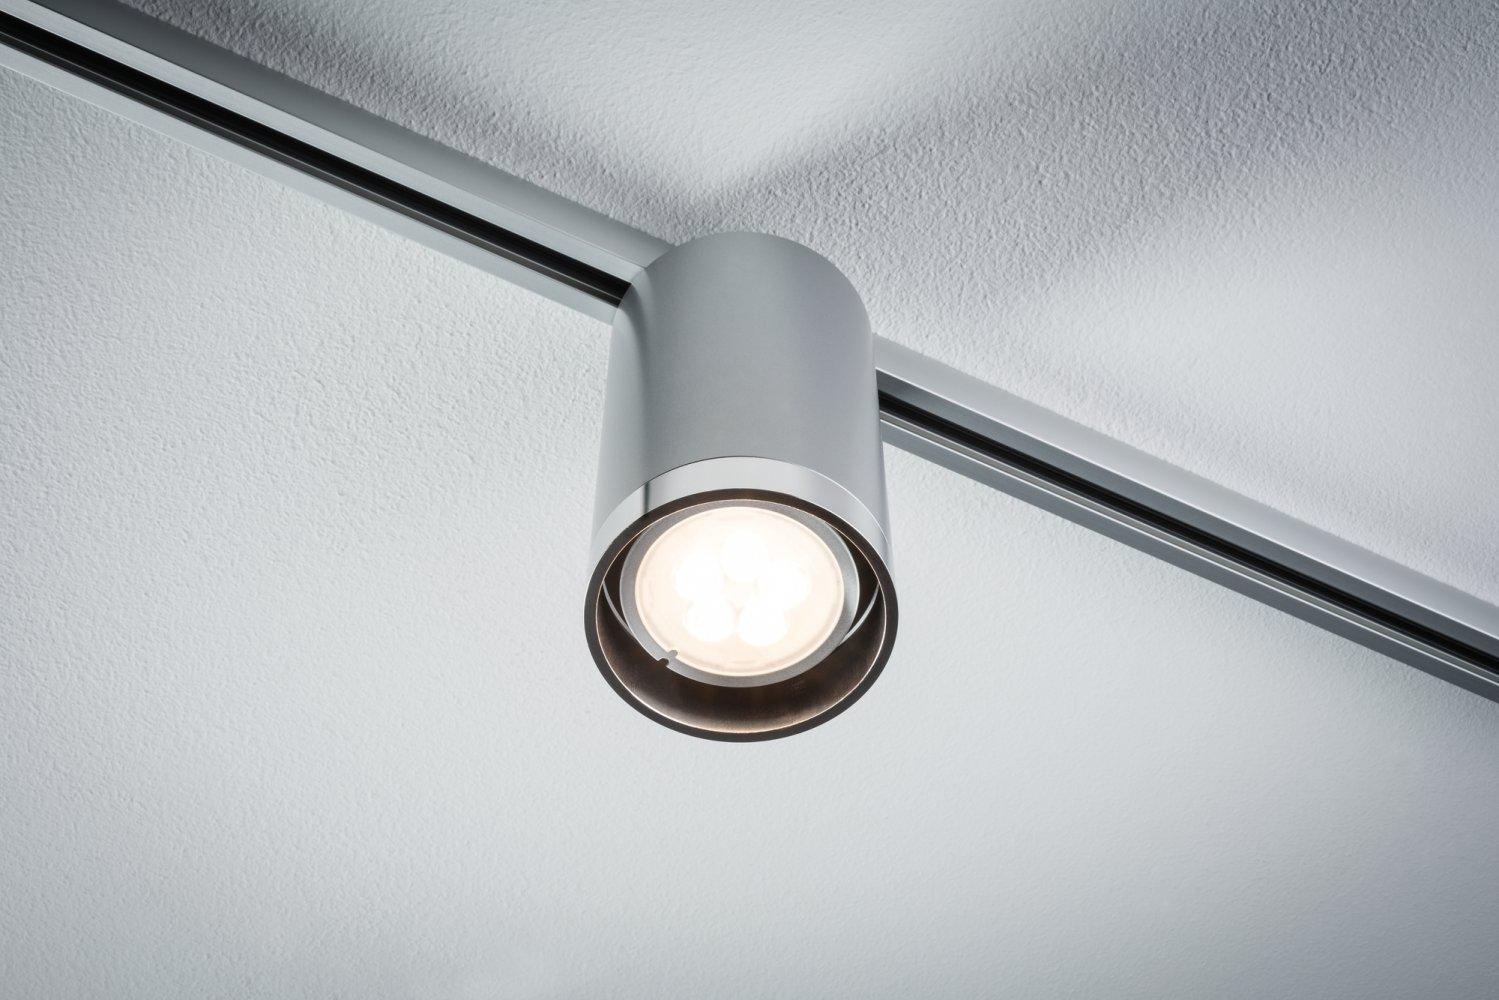 paulmann no 95285 urail led spot 1x6 5w tube 230v. Black Bedroom Furniture Sets. Home Design Ideas